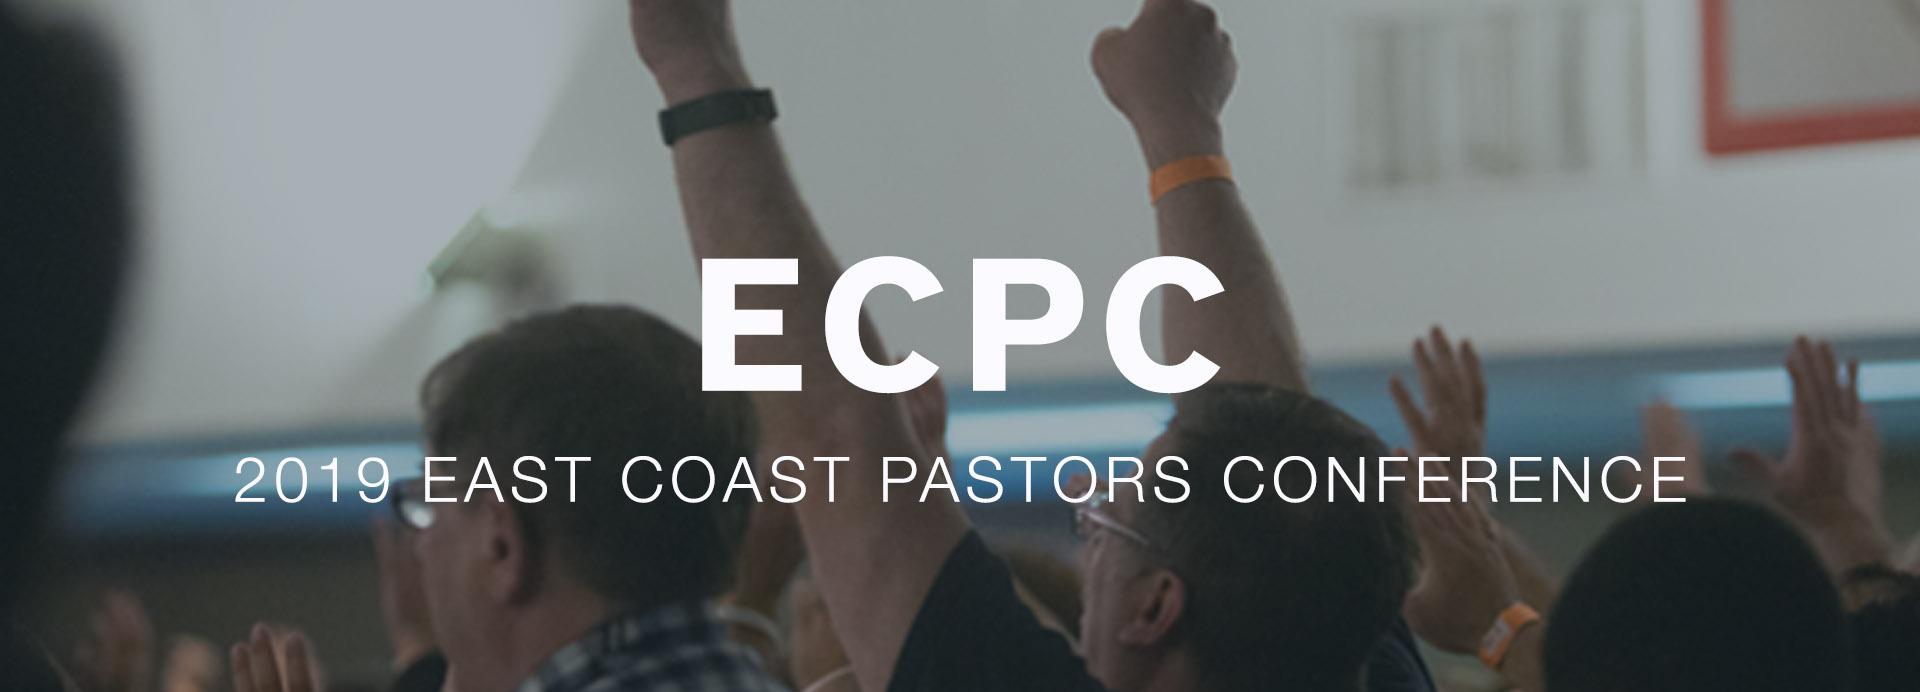 East Coast Pastors Conference 2019